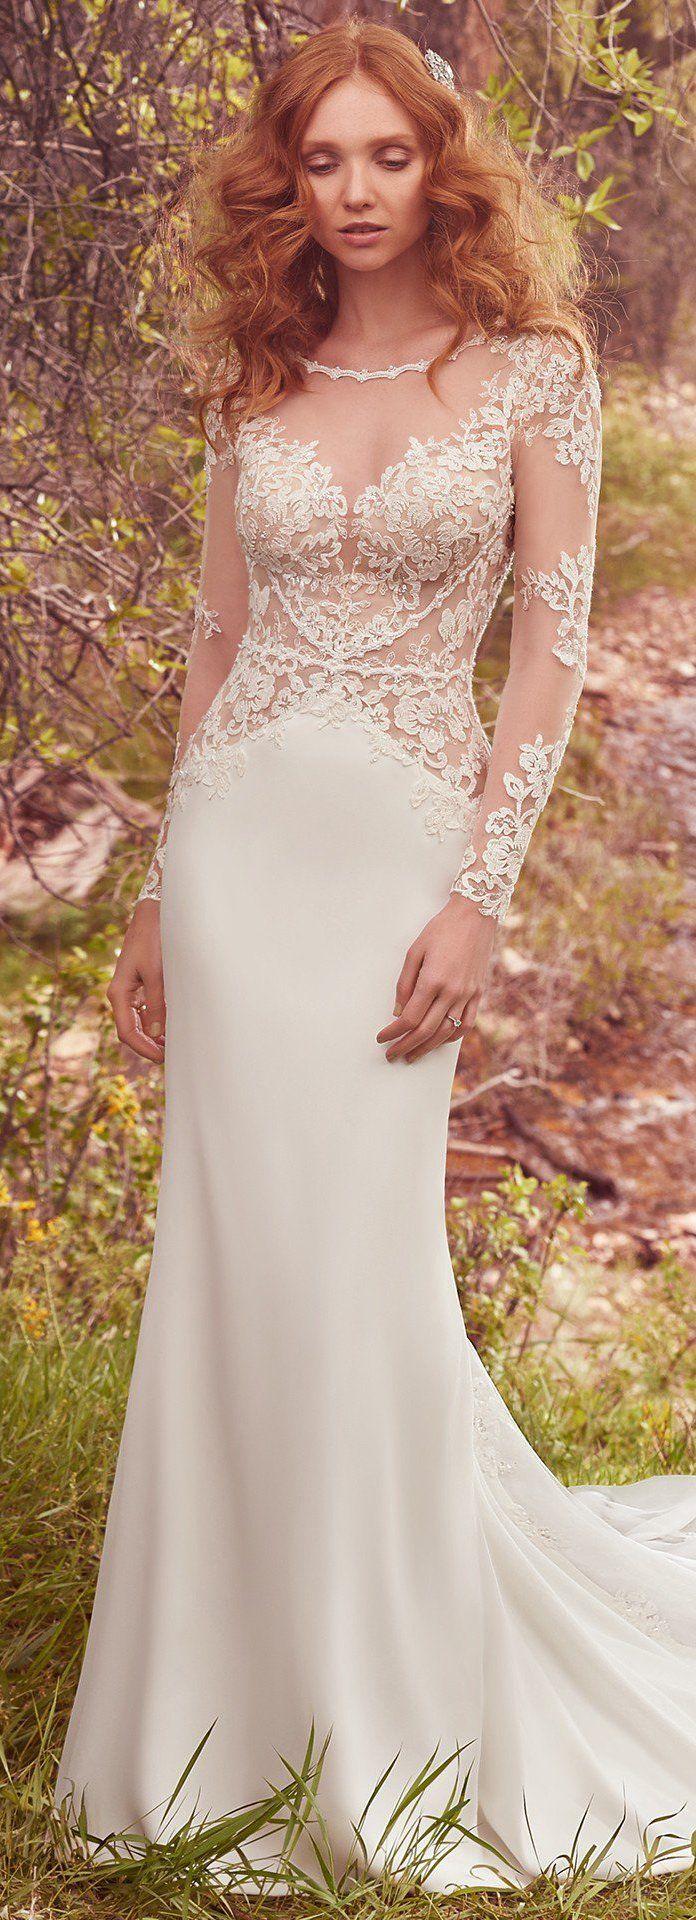 247 best maggie sottero images on pinterest short for Maggie sottero short wedding dress